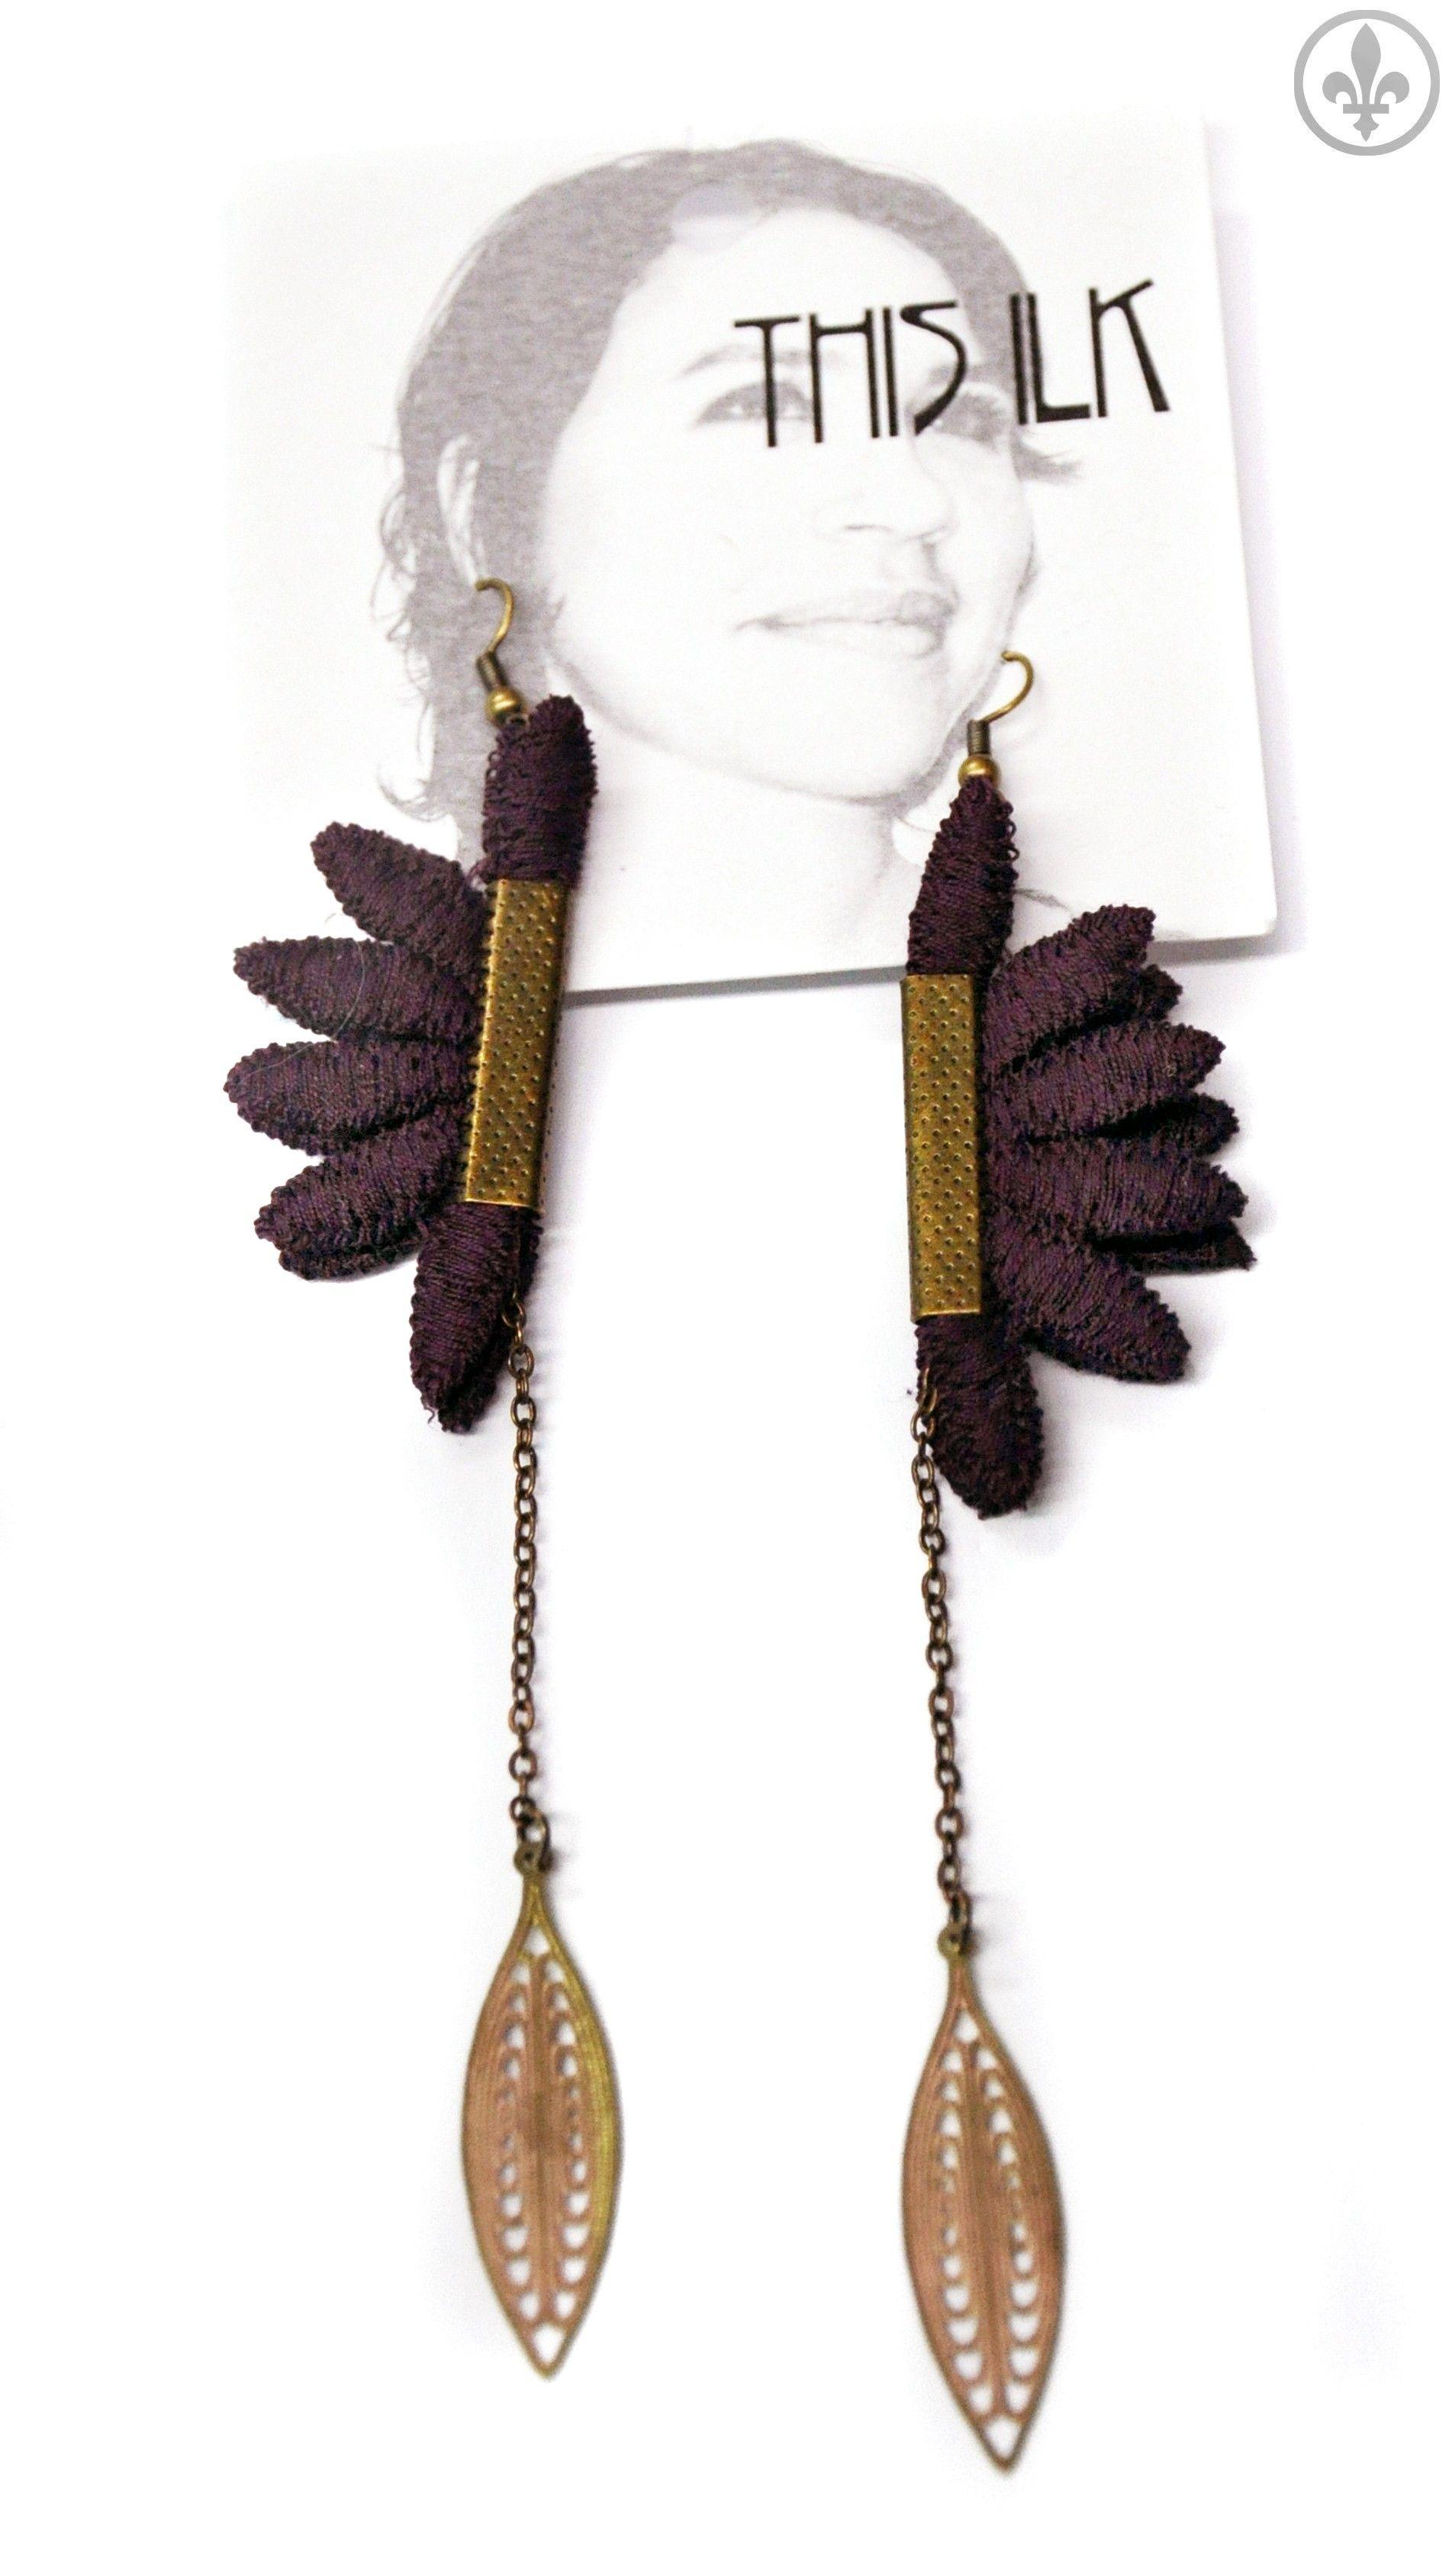 Boucles d'oreilles Pendulum de This Ilk Jewelry, Tassel